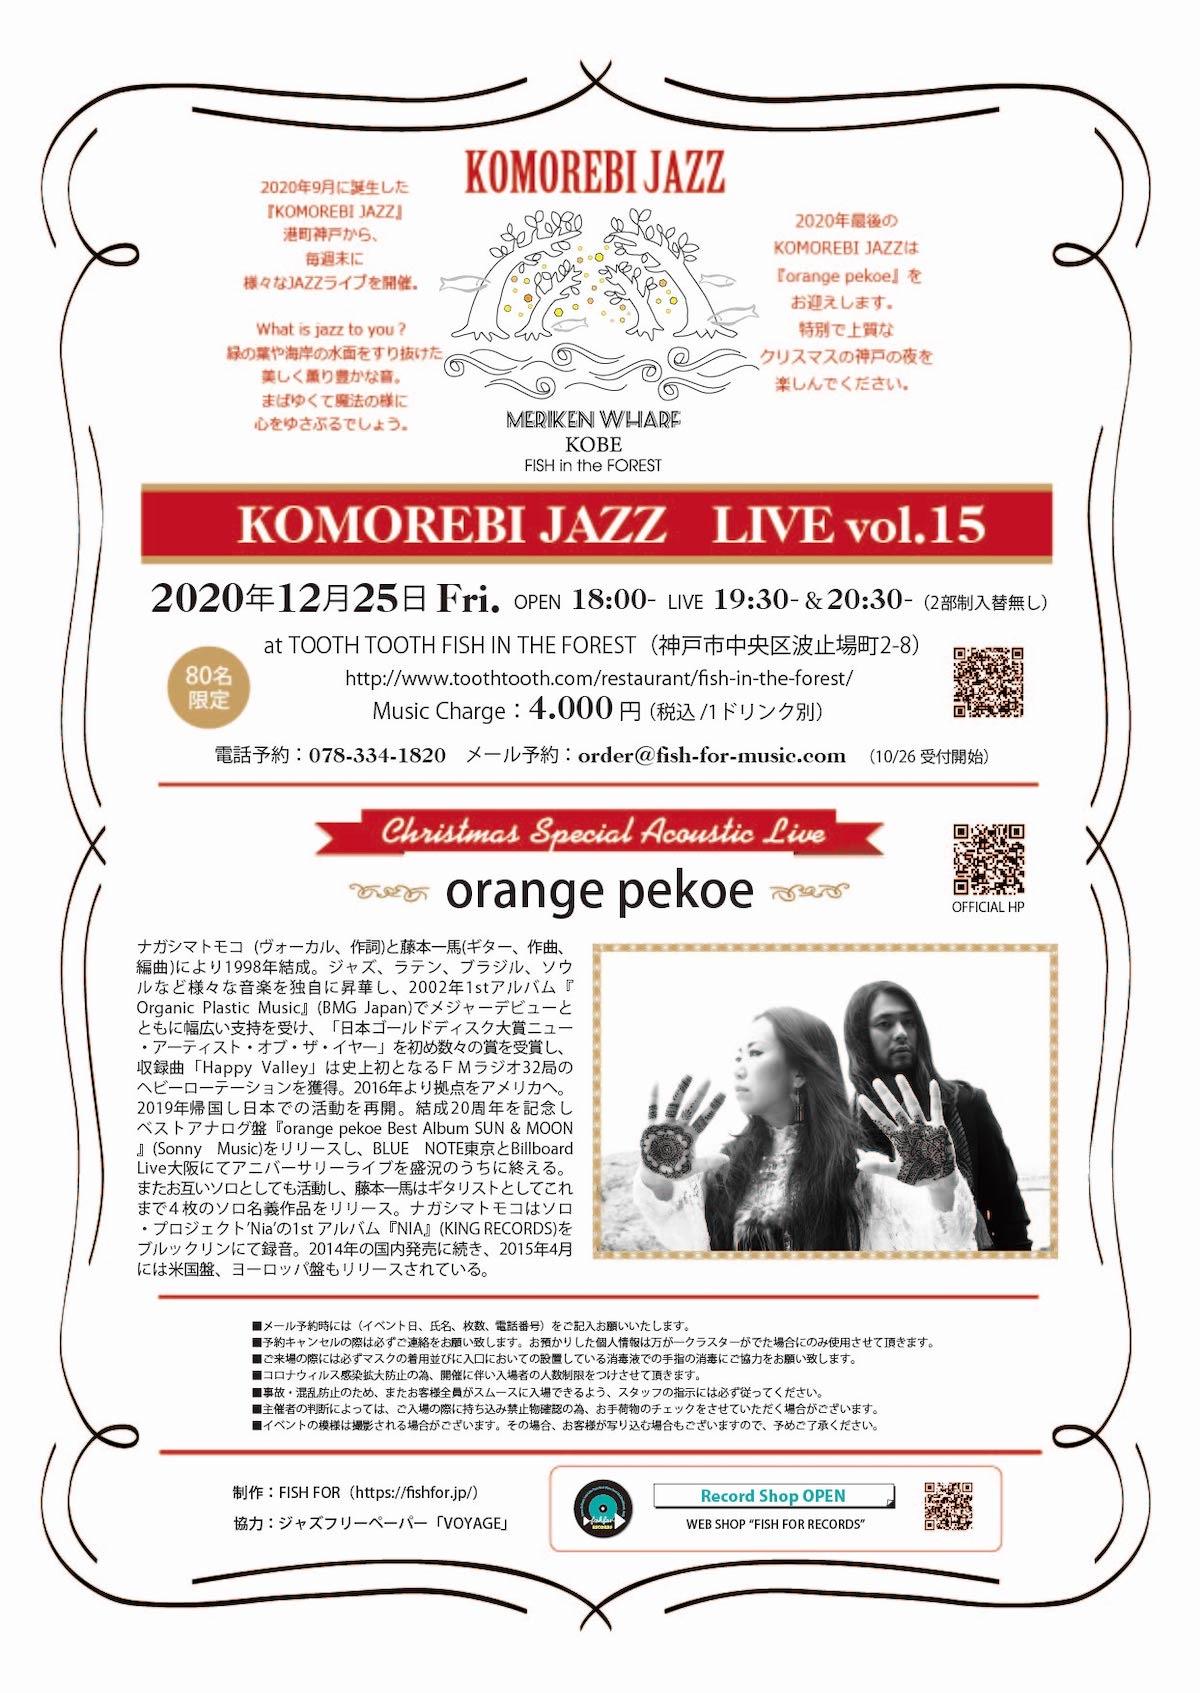 KOMOREBI JAZZ LIVE vol.15 ~Christmas Special Acoustic Live~